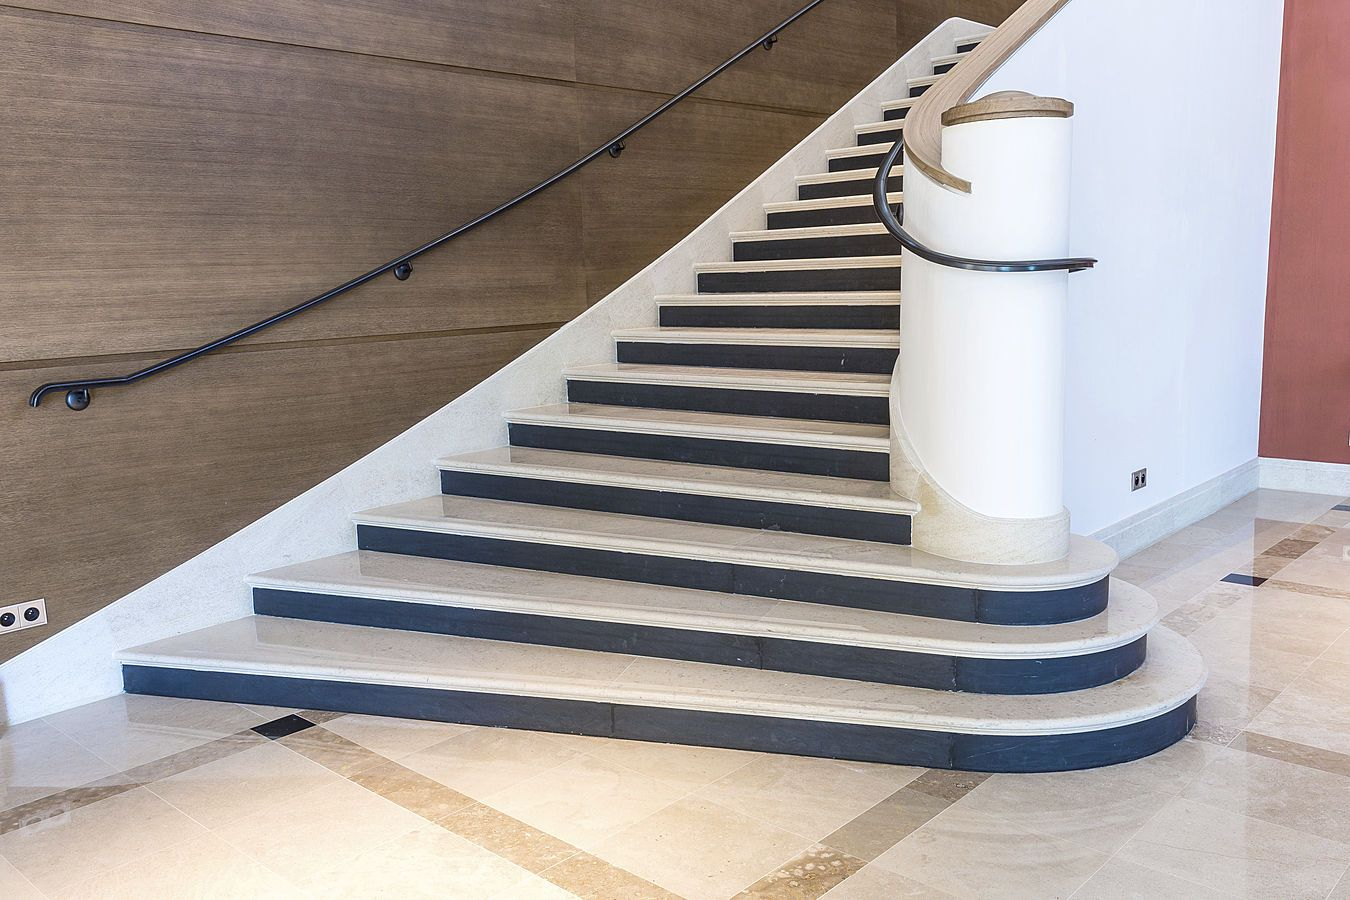 pin escalier beton on pinterest. Black Bedroom Furniture Sets. Home Design Ideas